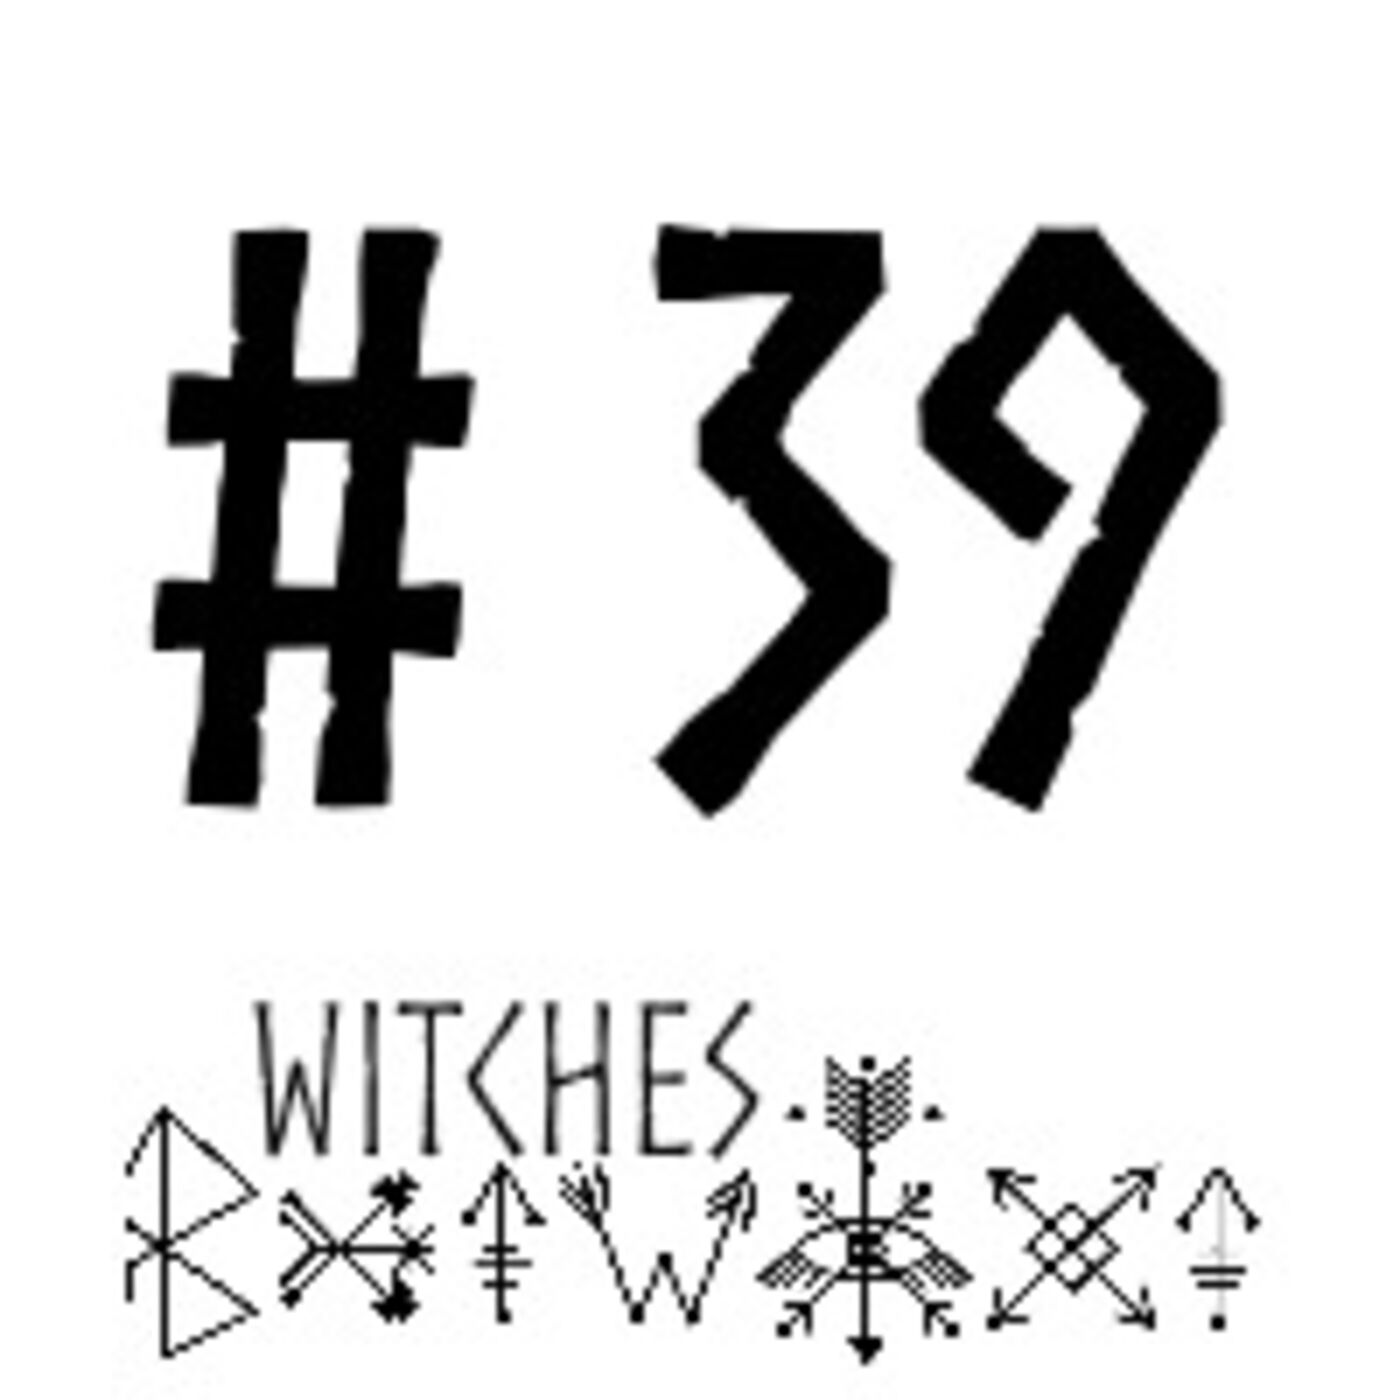 WBTWXT EP #39 - Beltane 2020 Special: The Kink Episode!